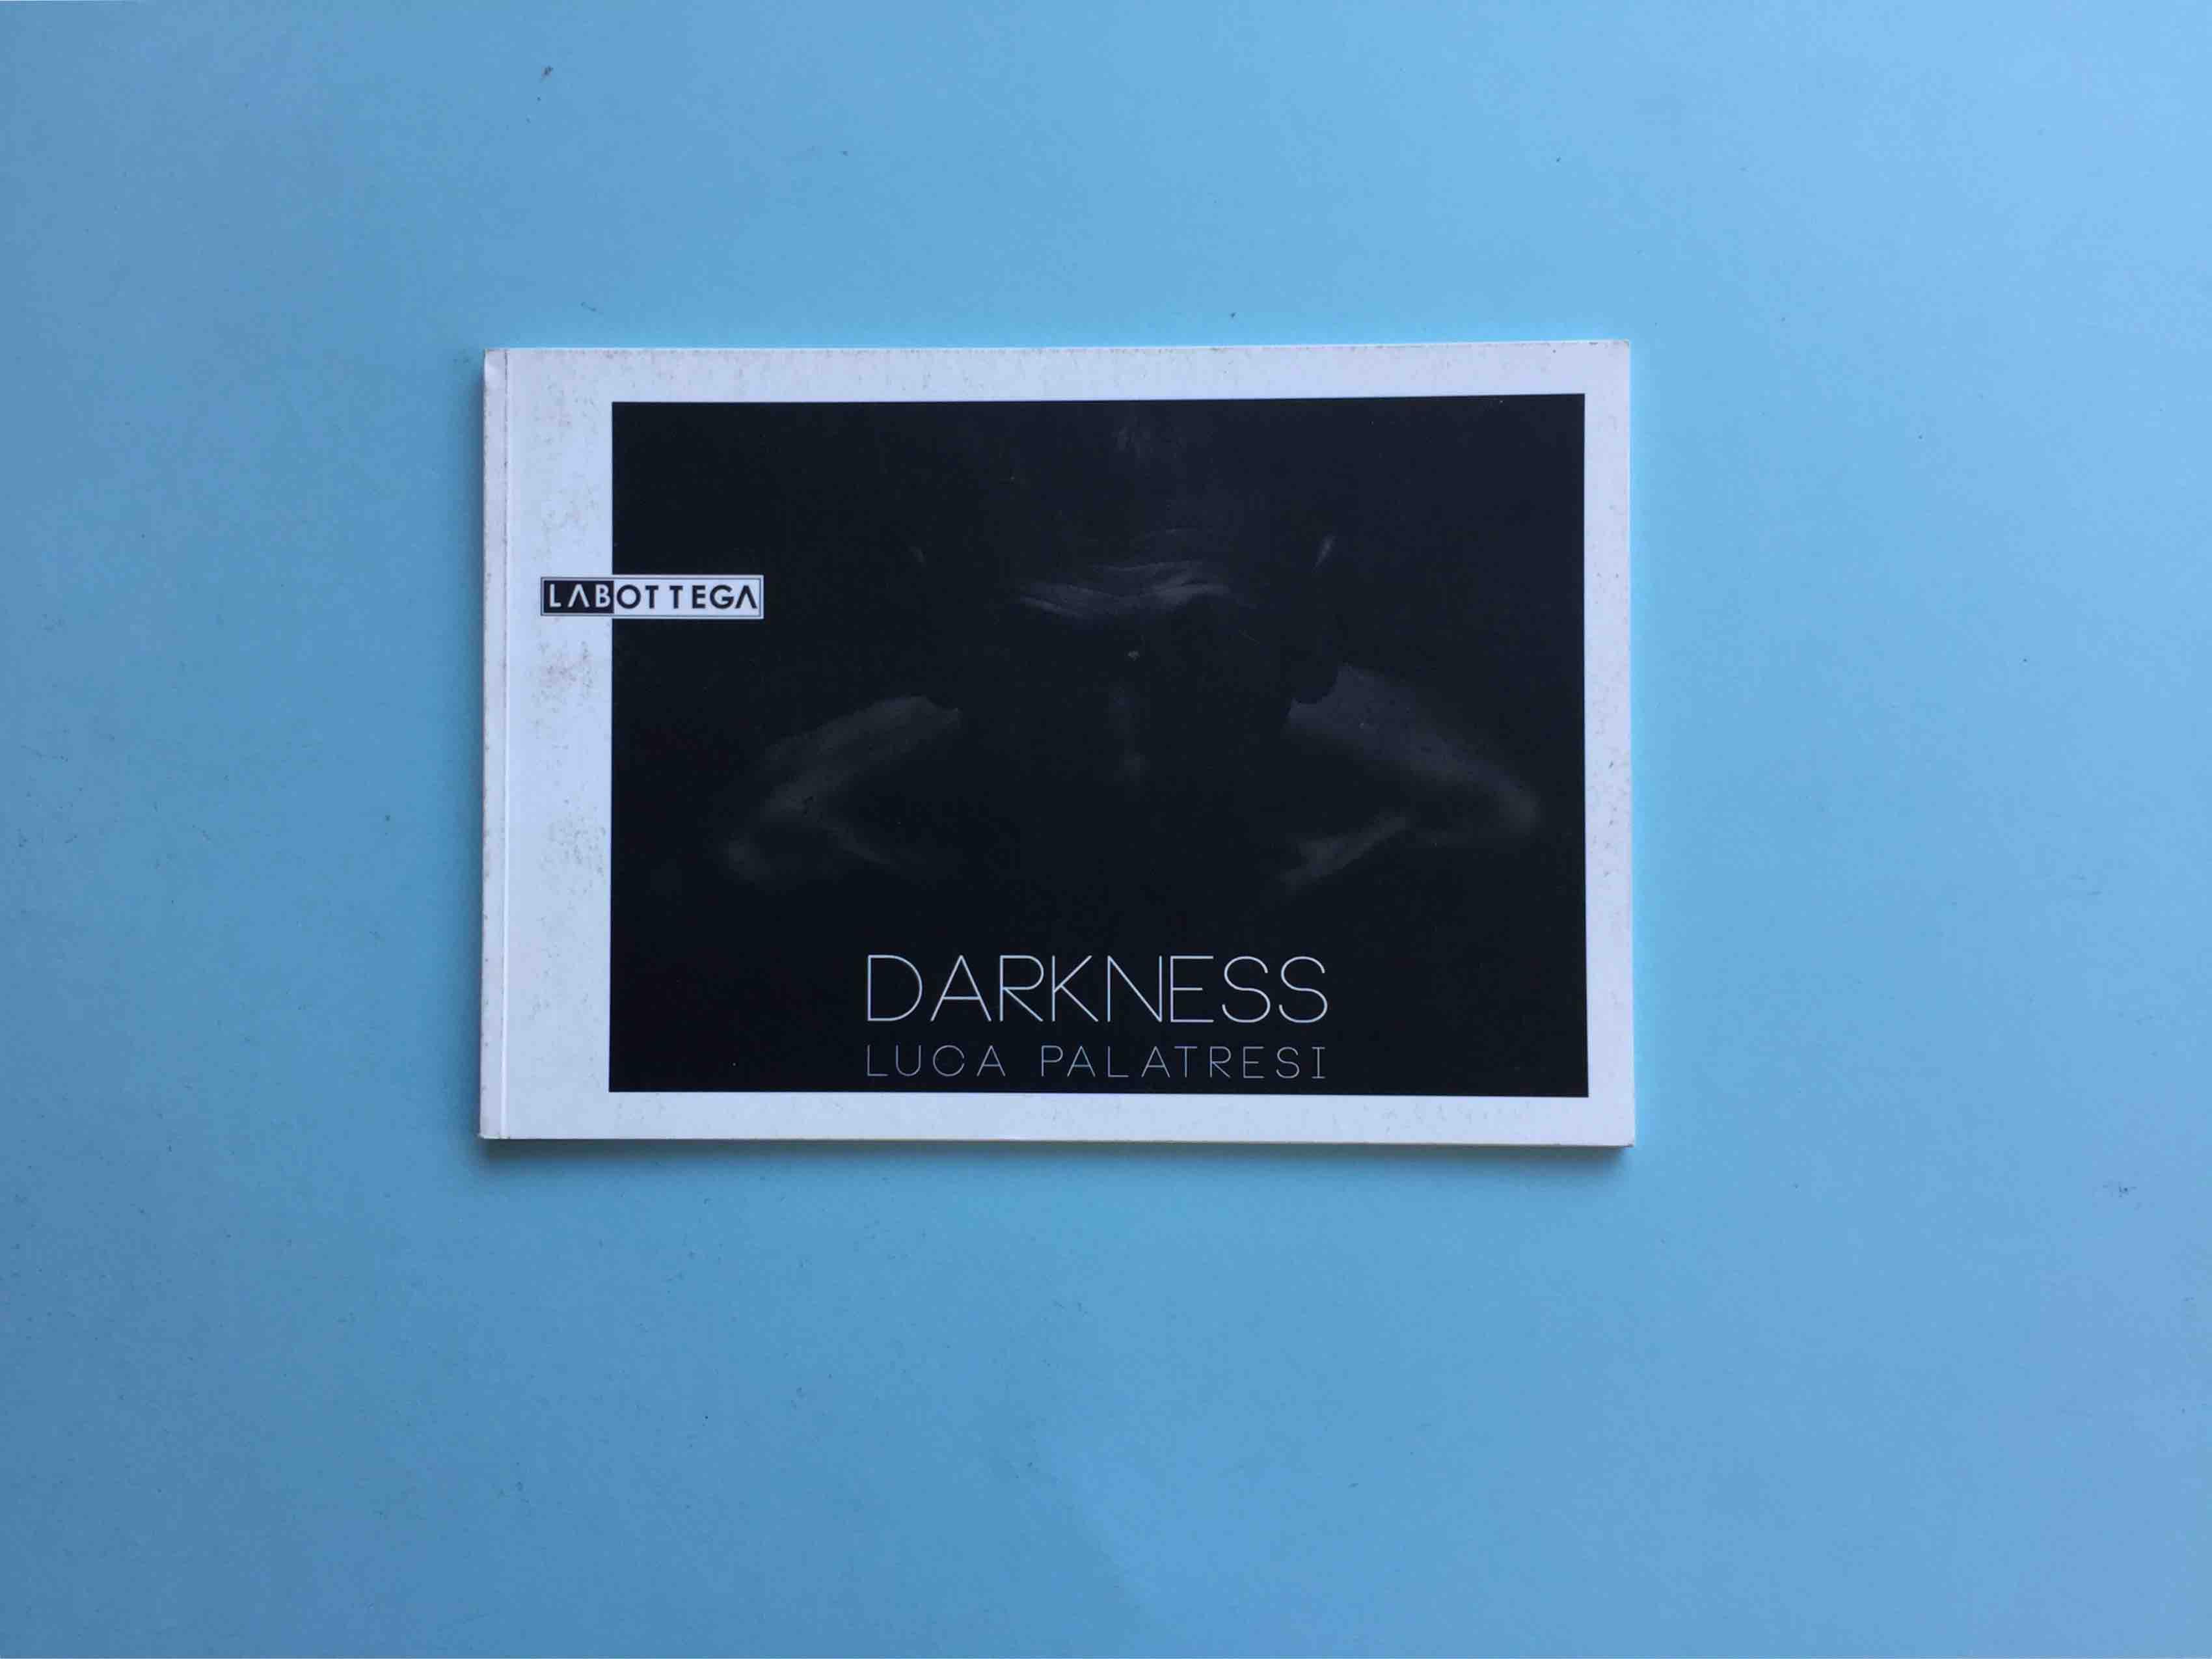 DARKNESS / LUCA PALATRESI